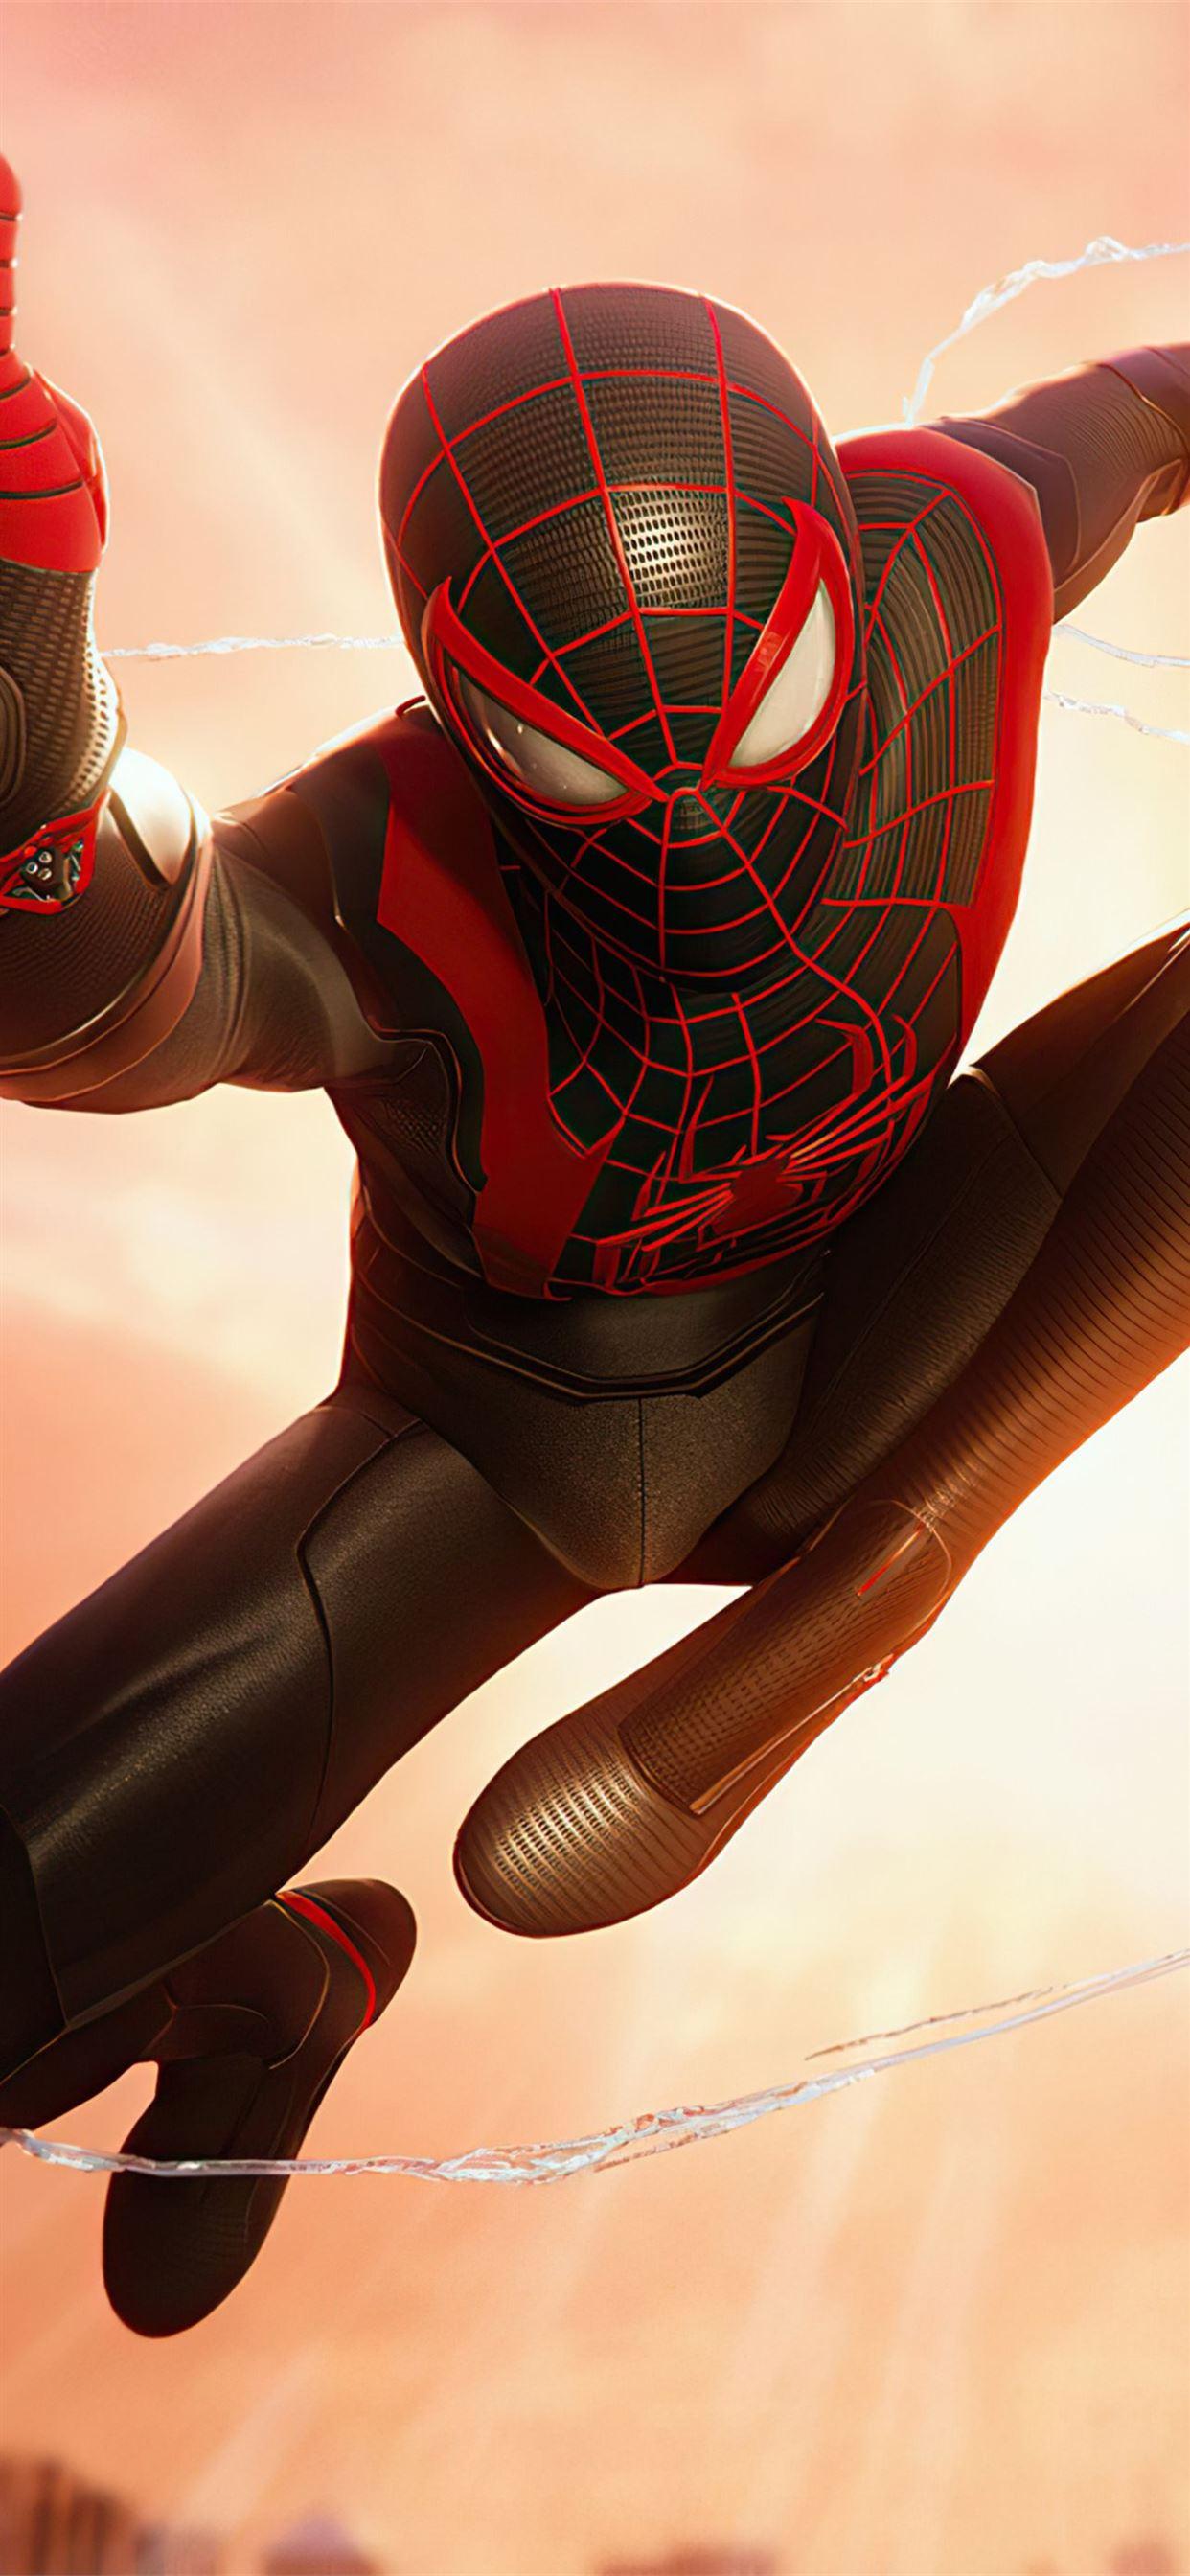 4k Marvels Spiderman Miles Morales Iphone X Wallpapers Free Download